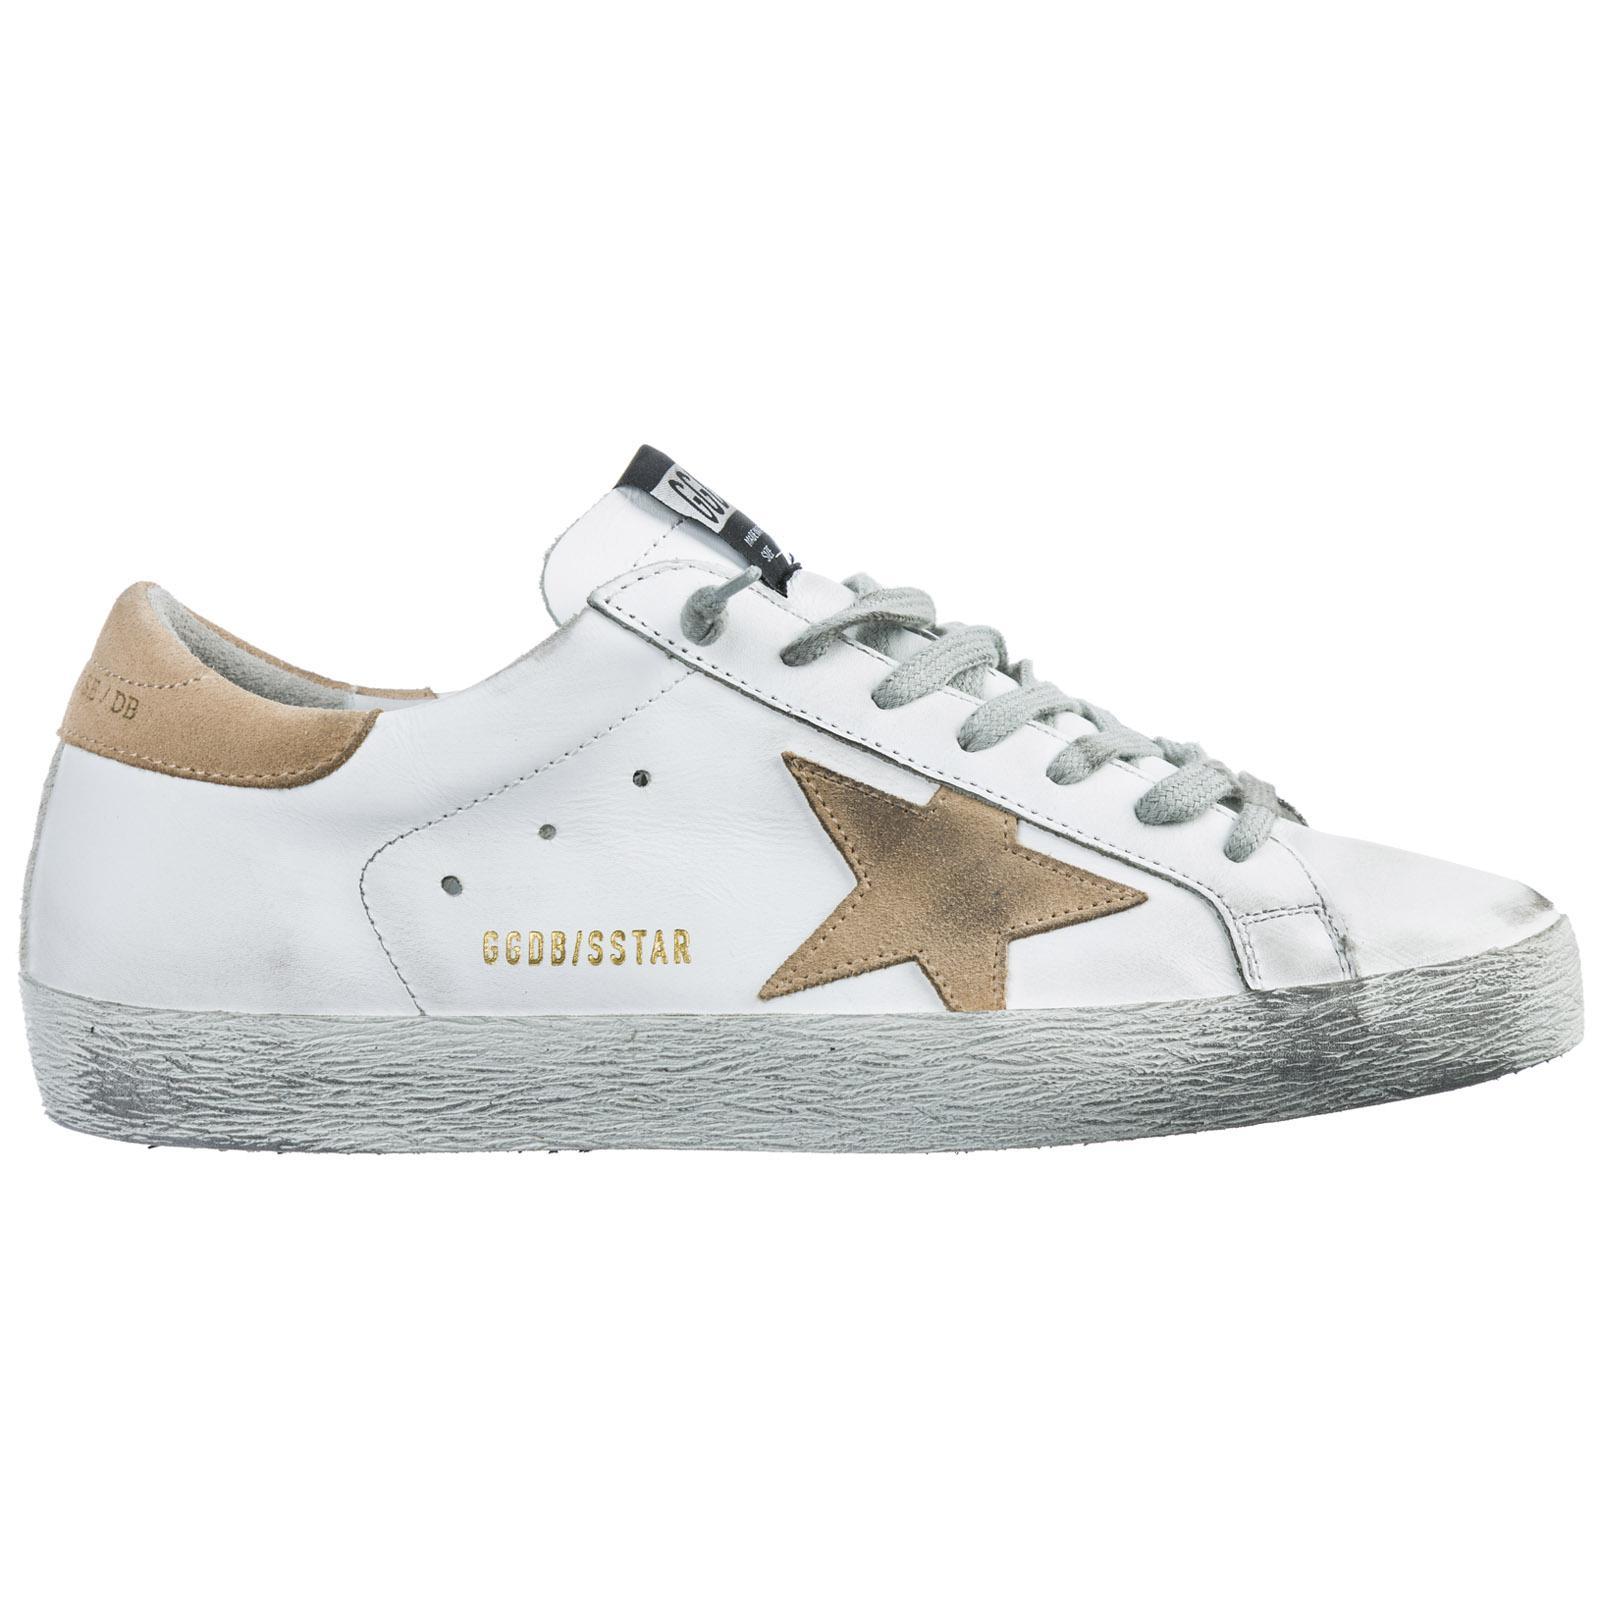 c7776c3c1b Golden Goose Deluxe Brand. Men's Shoes Leather Trainers Sneakers Superstar